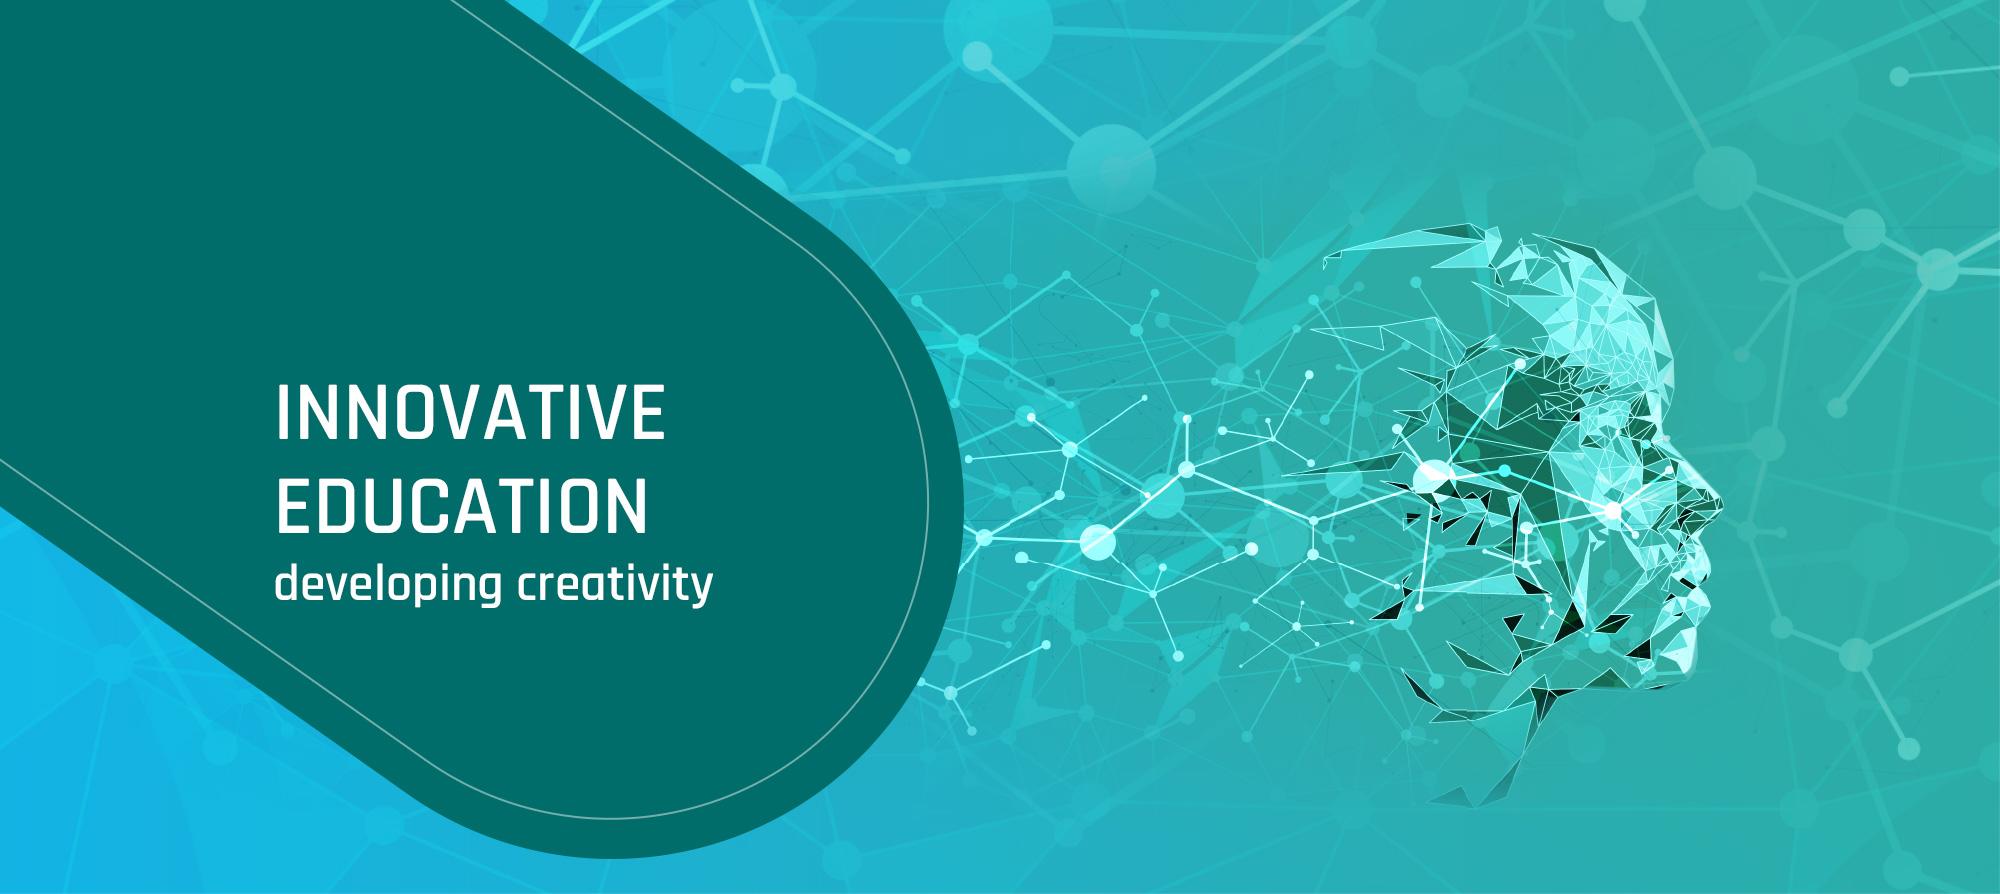 INNOVATIVE EDUCATION developing creativity